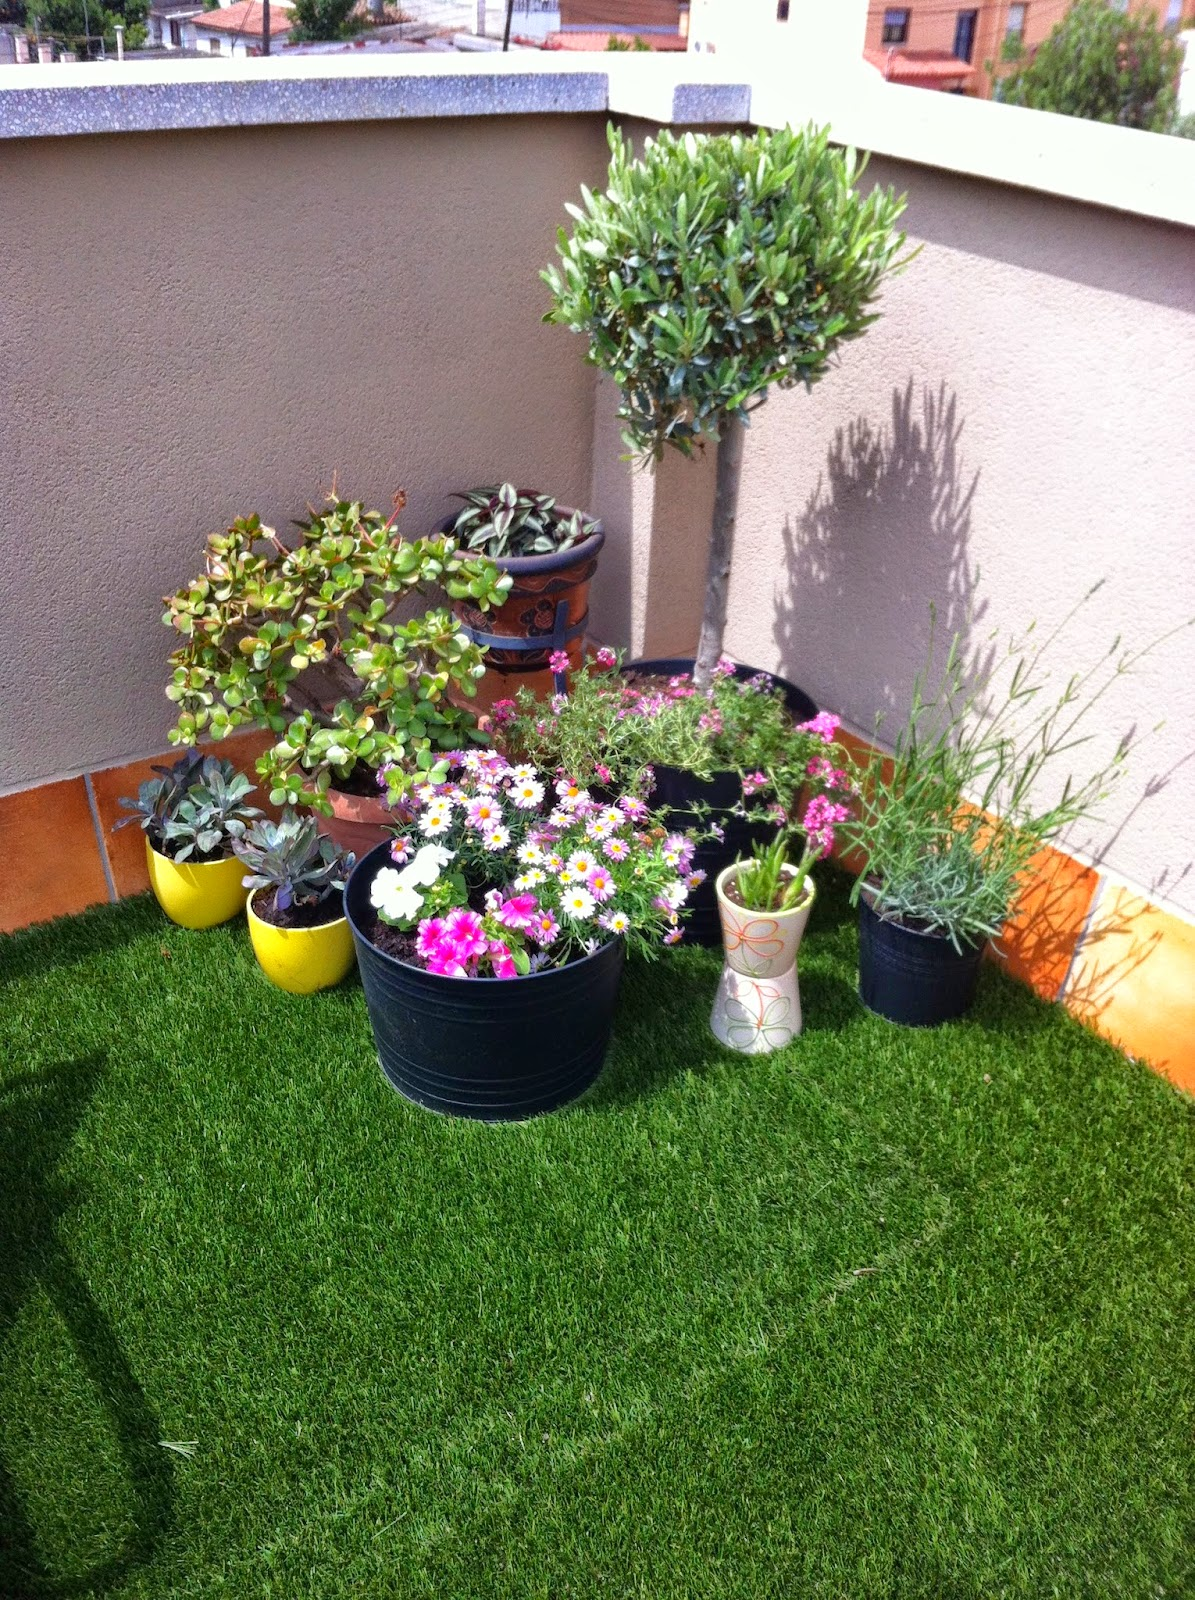 rincón relax con agrupación de plantas y cómodas hamacas